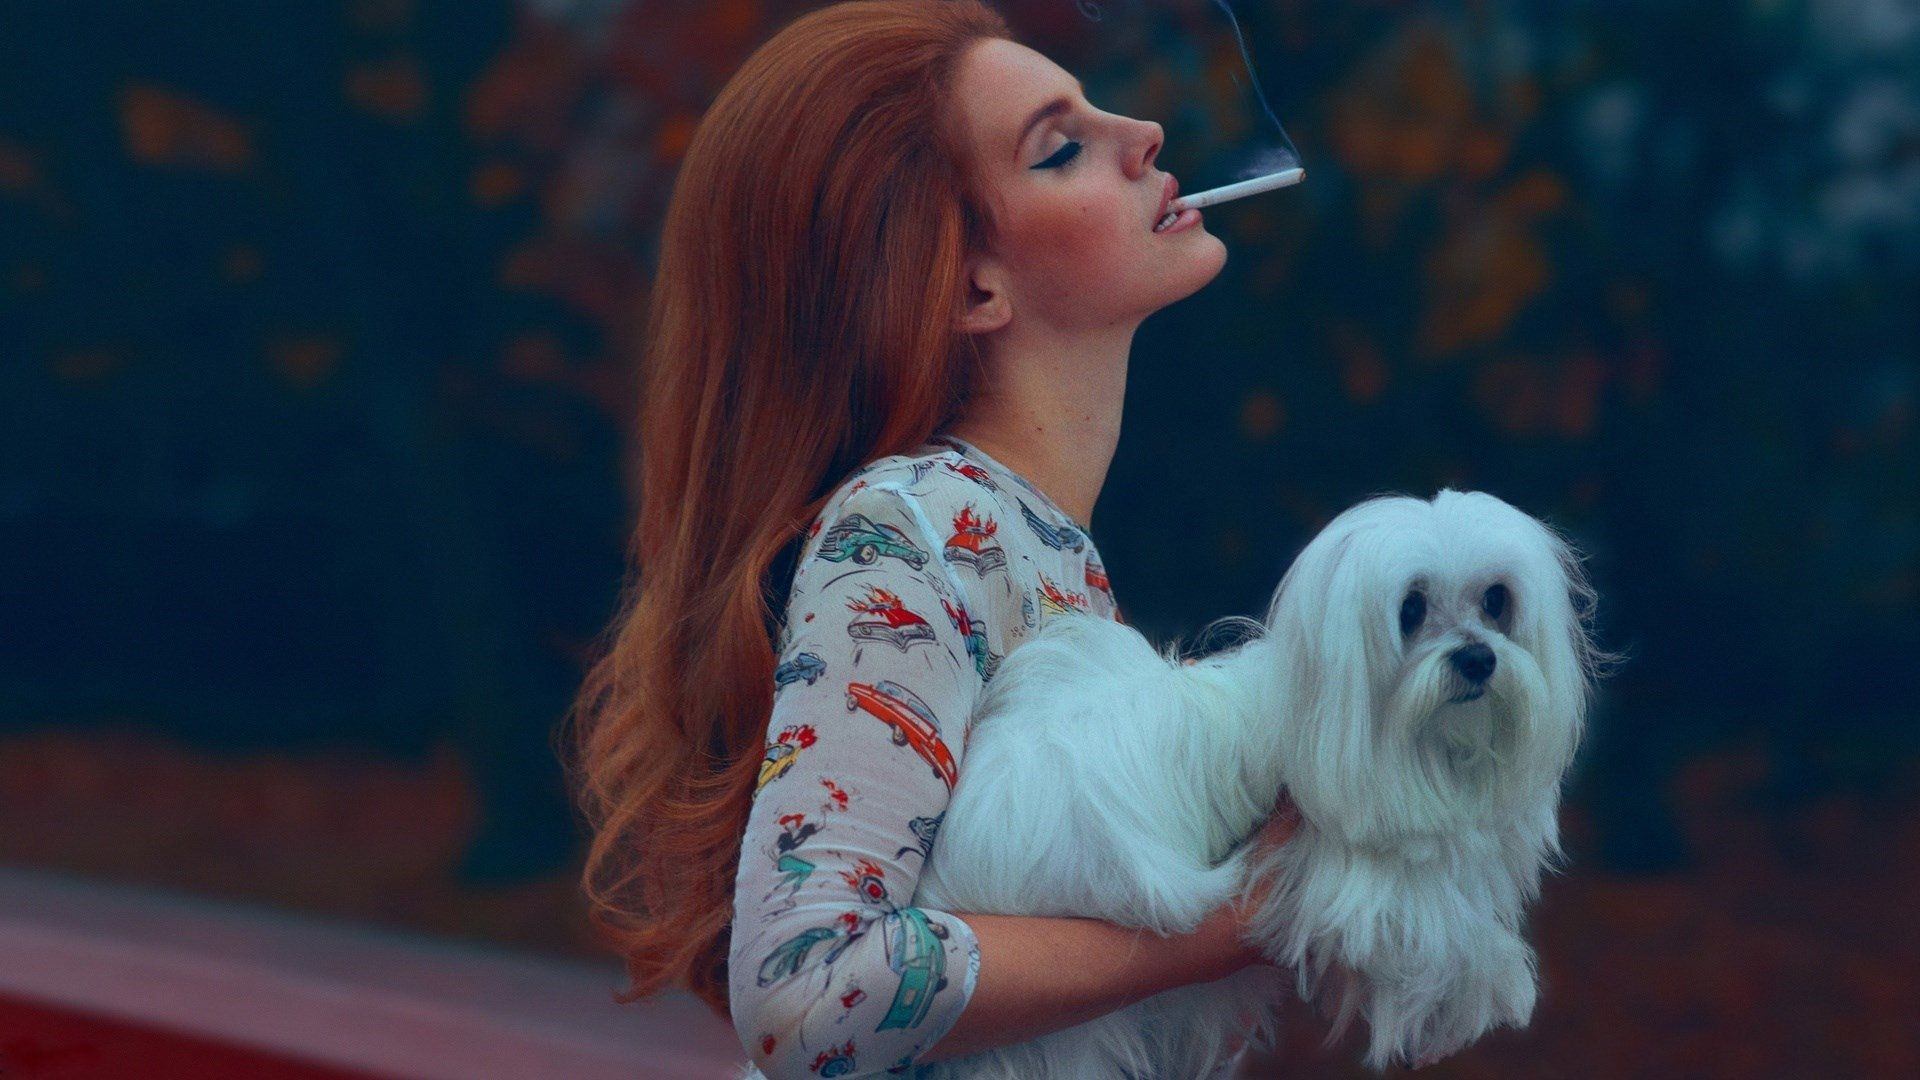 10 Top Lana Del Rey Wallpaper Full Hd 1920 1080 For Pc Background Lana Del Rey Ultraviolence Lana Del Rey Music Lana Del Rey